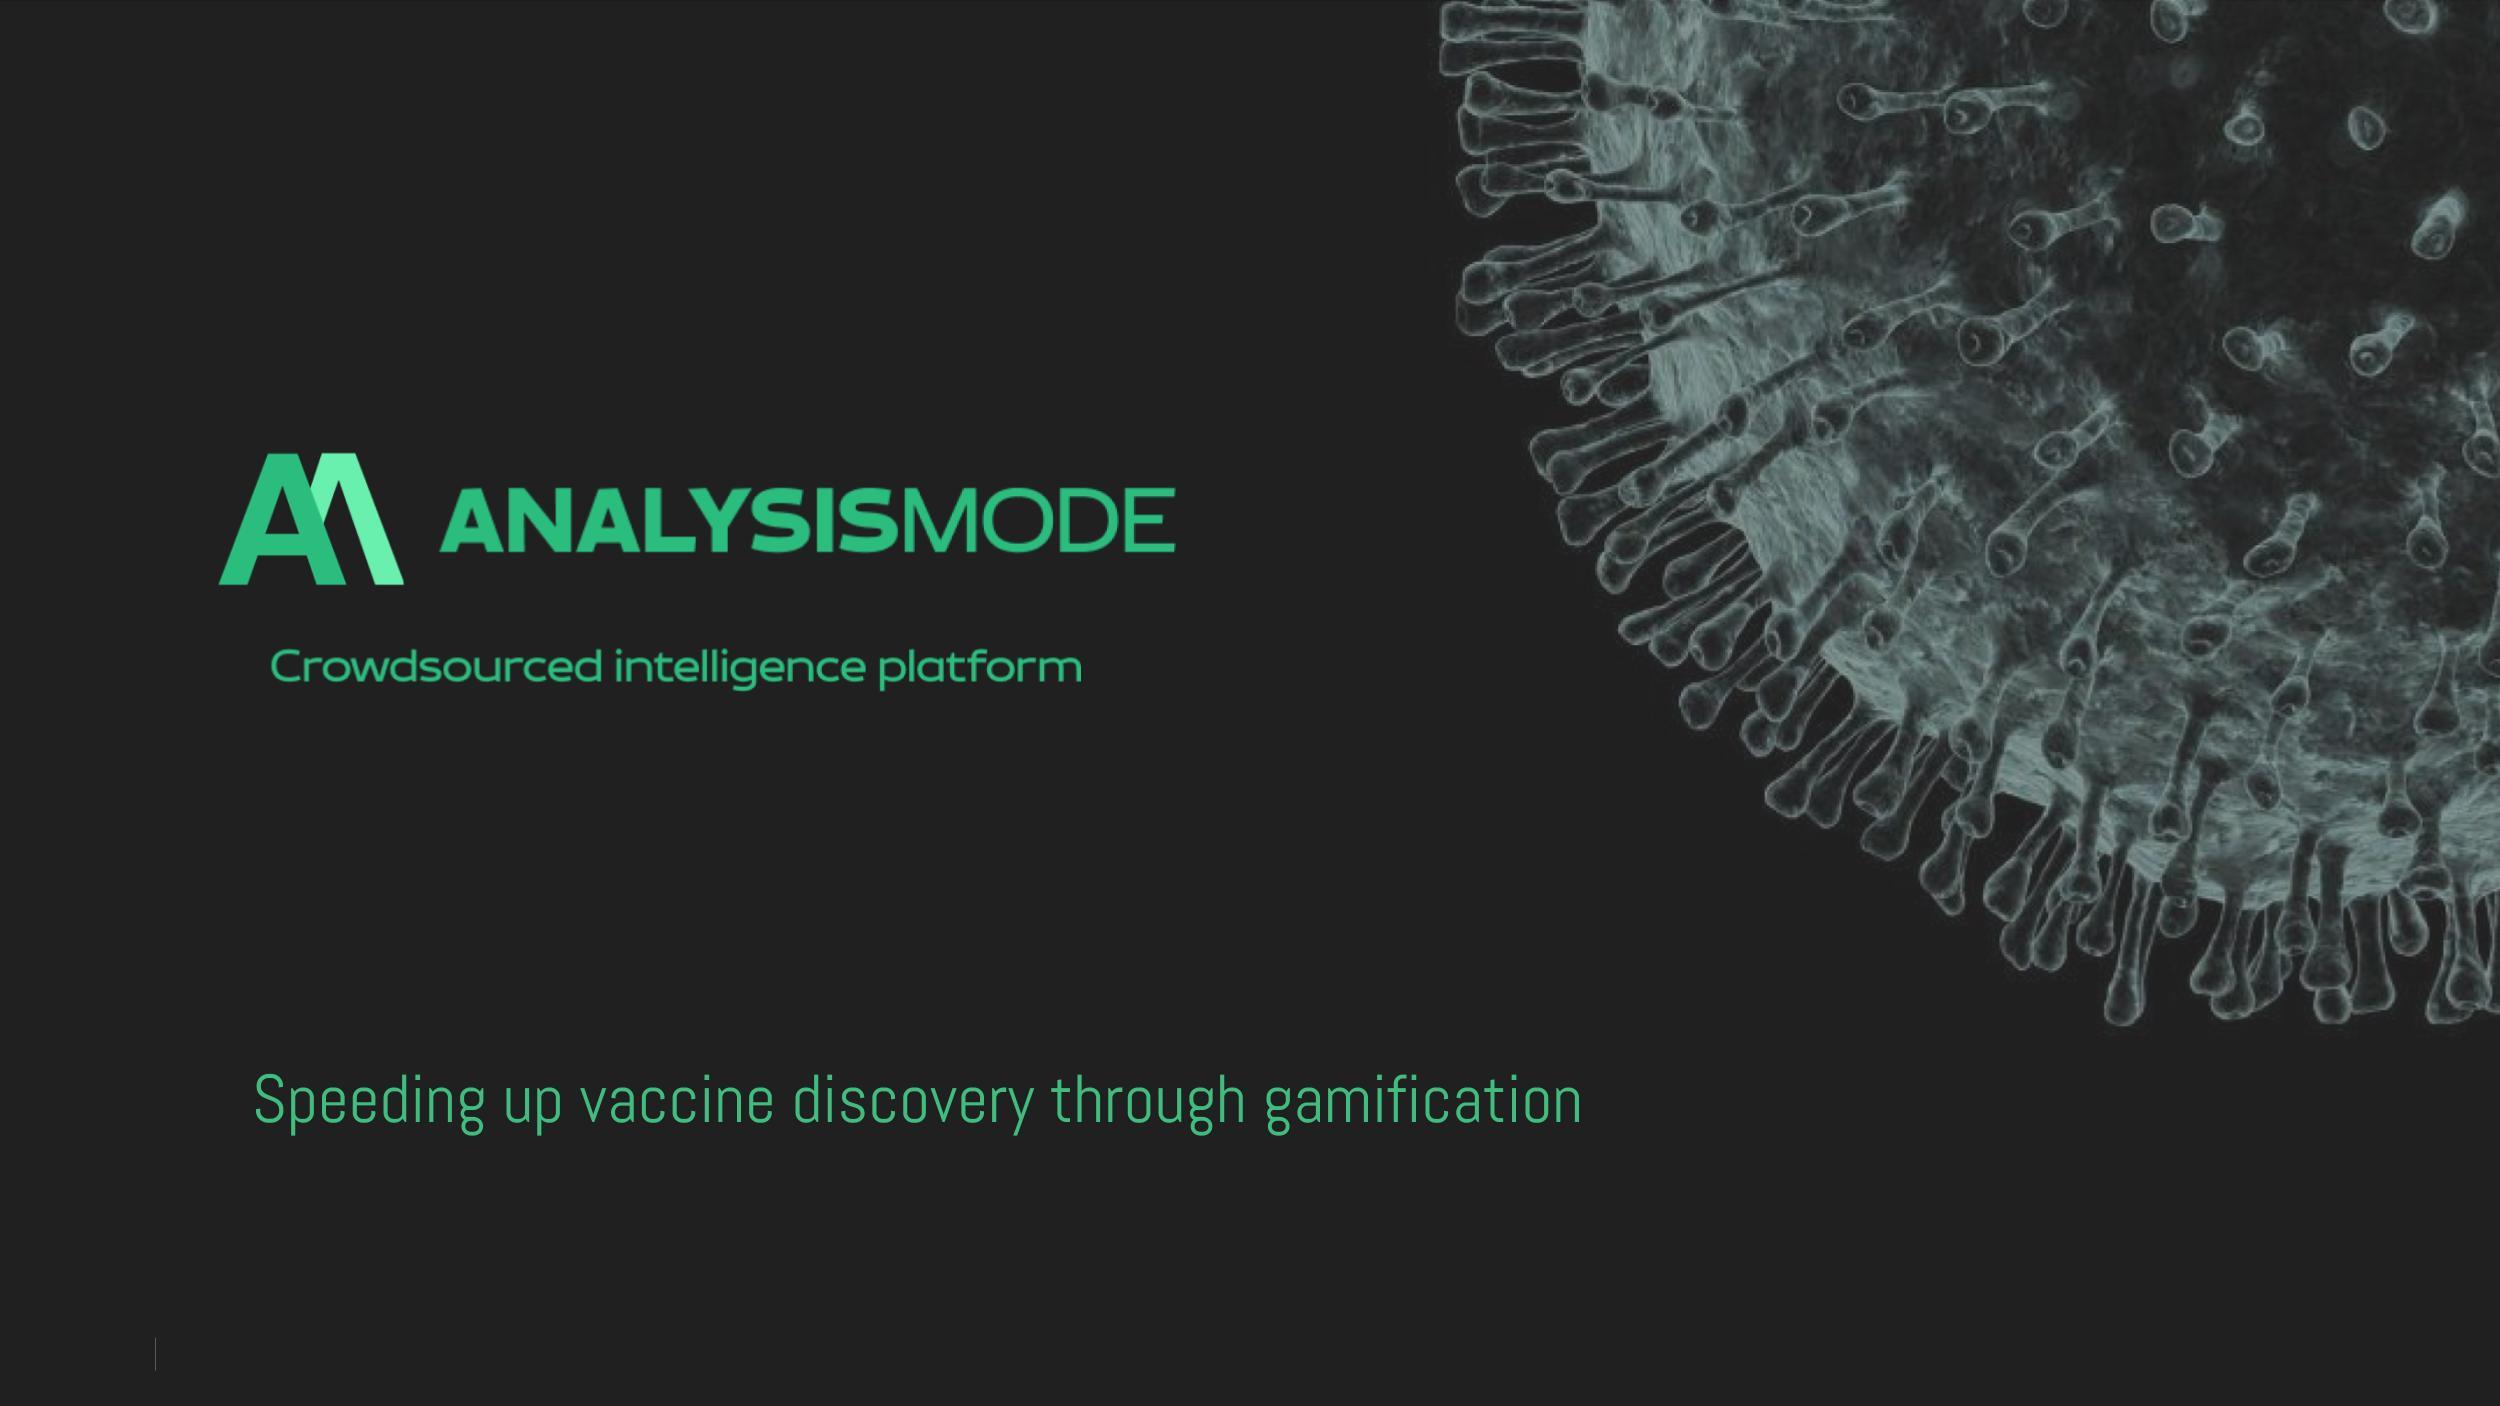 AnalysisMode.com